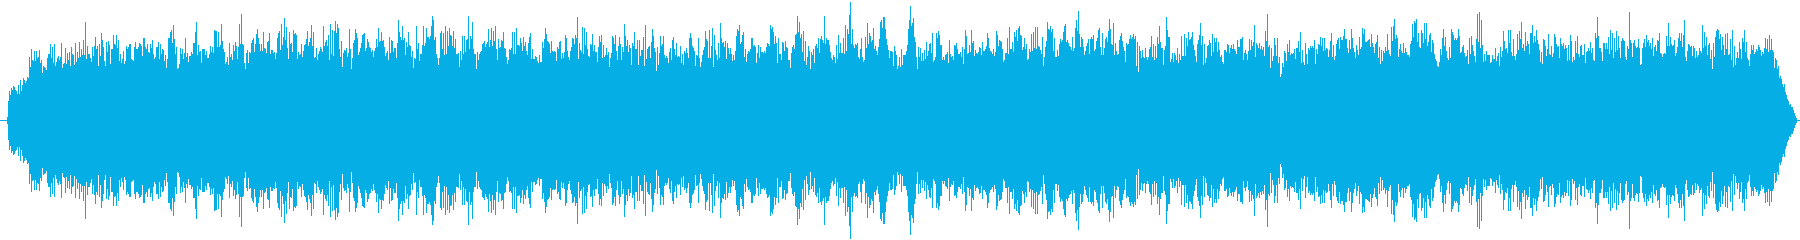 PADS 合唱団ハム01の再生済みの波形